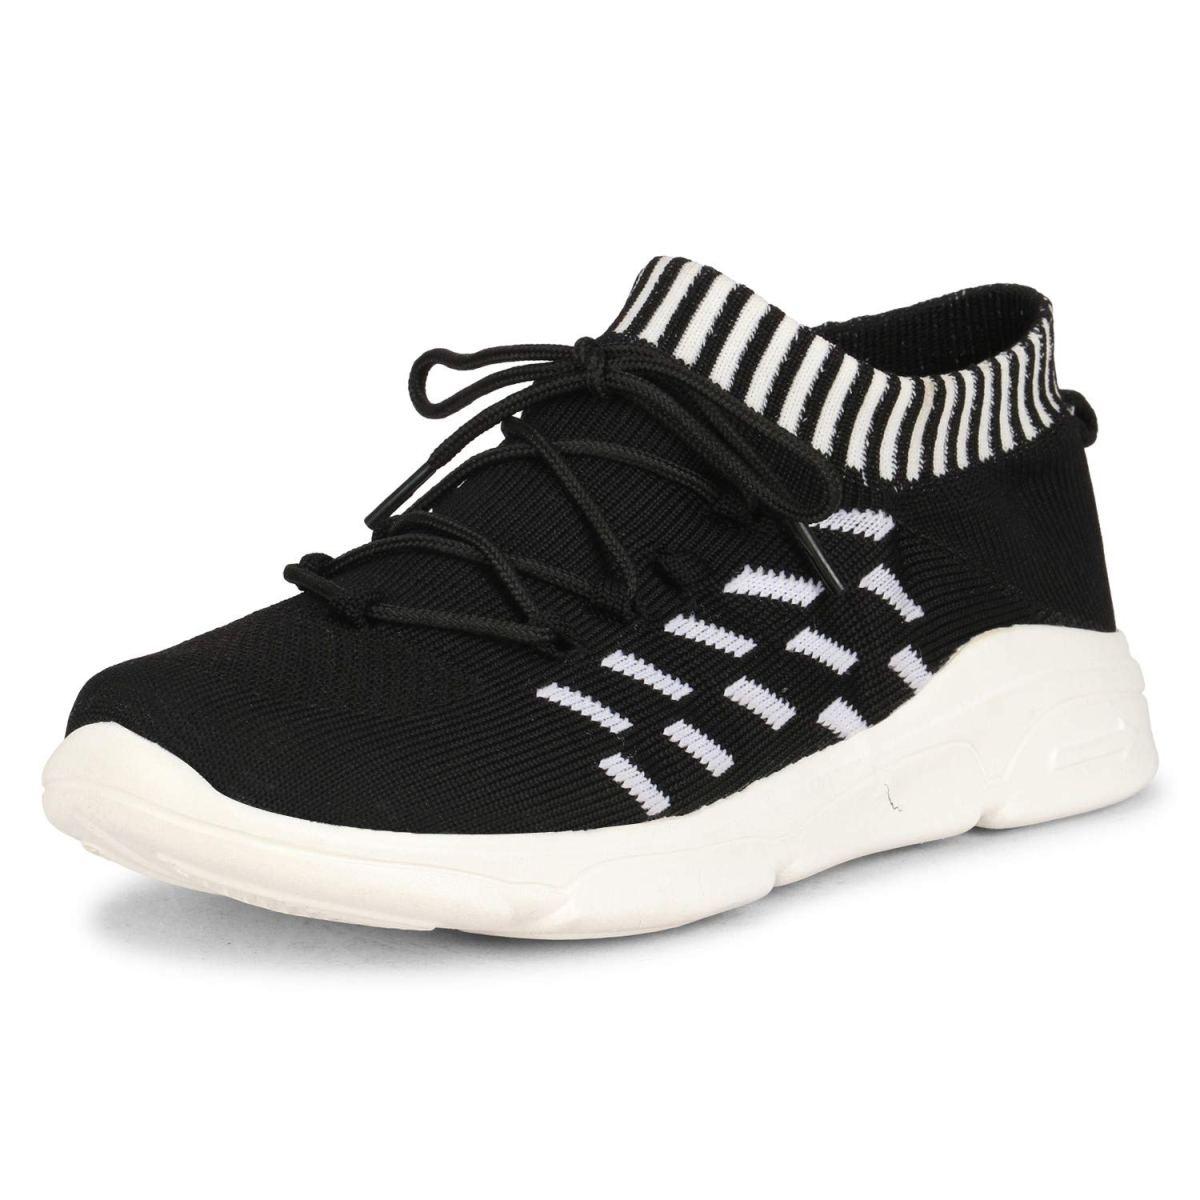 DYMO FOOTWEAR Running, Walking, Sports, Gym (Socks) Shoes for Women and Girls